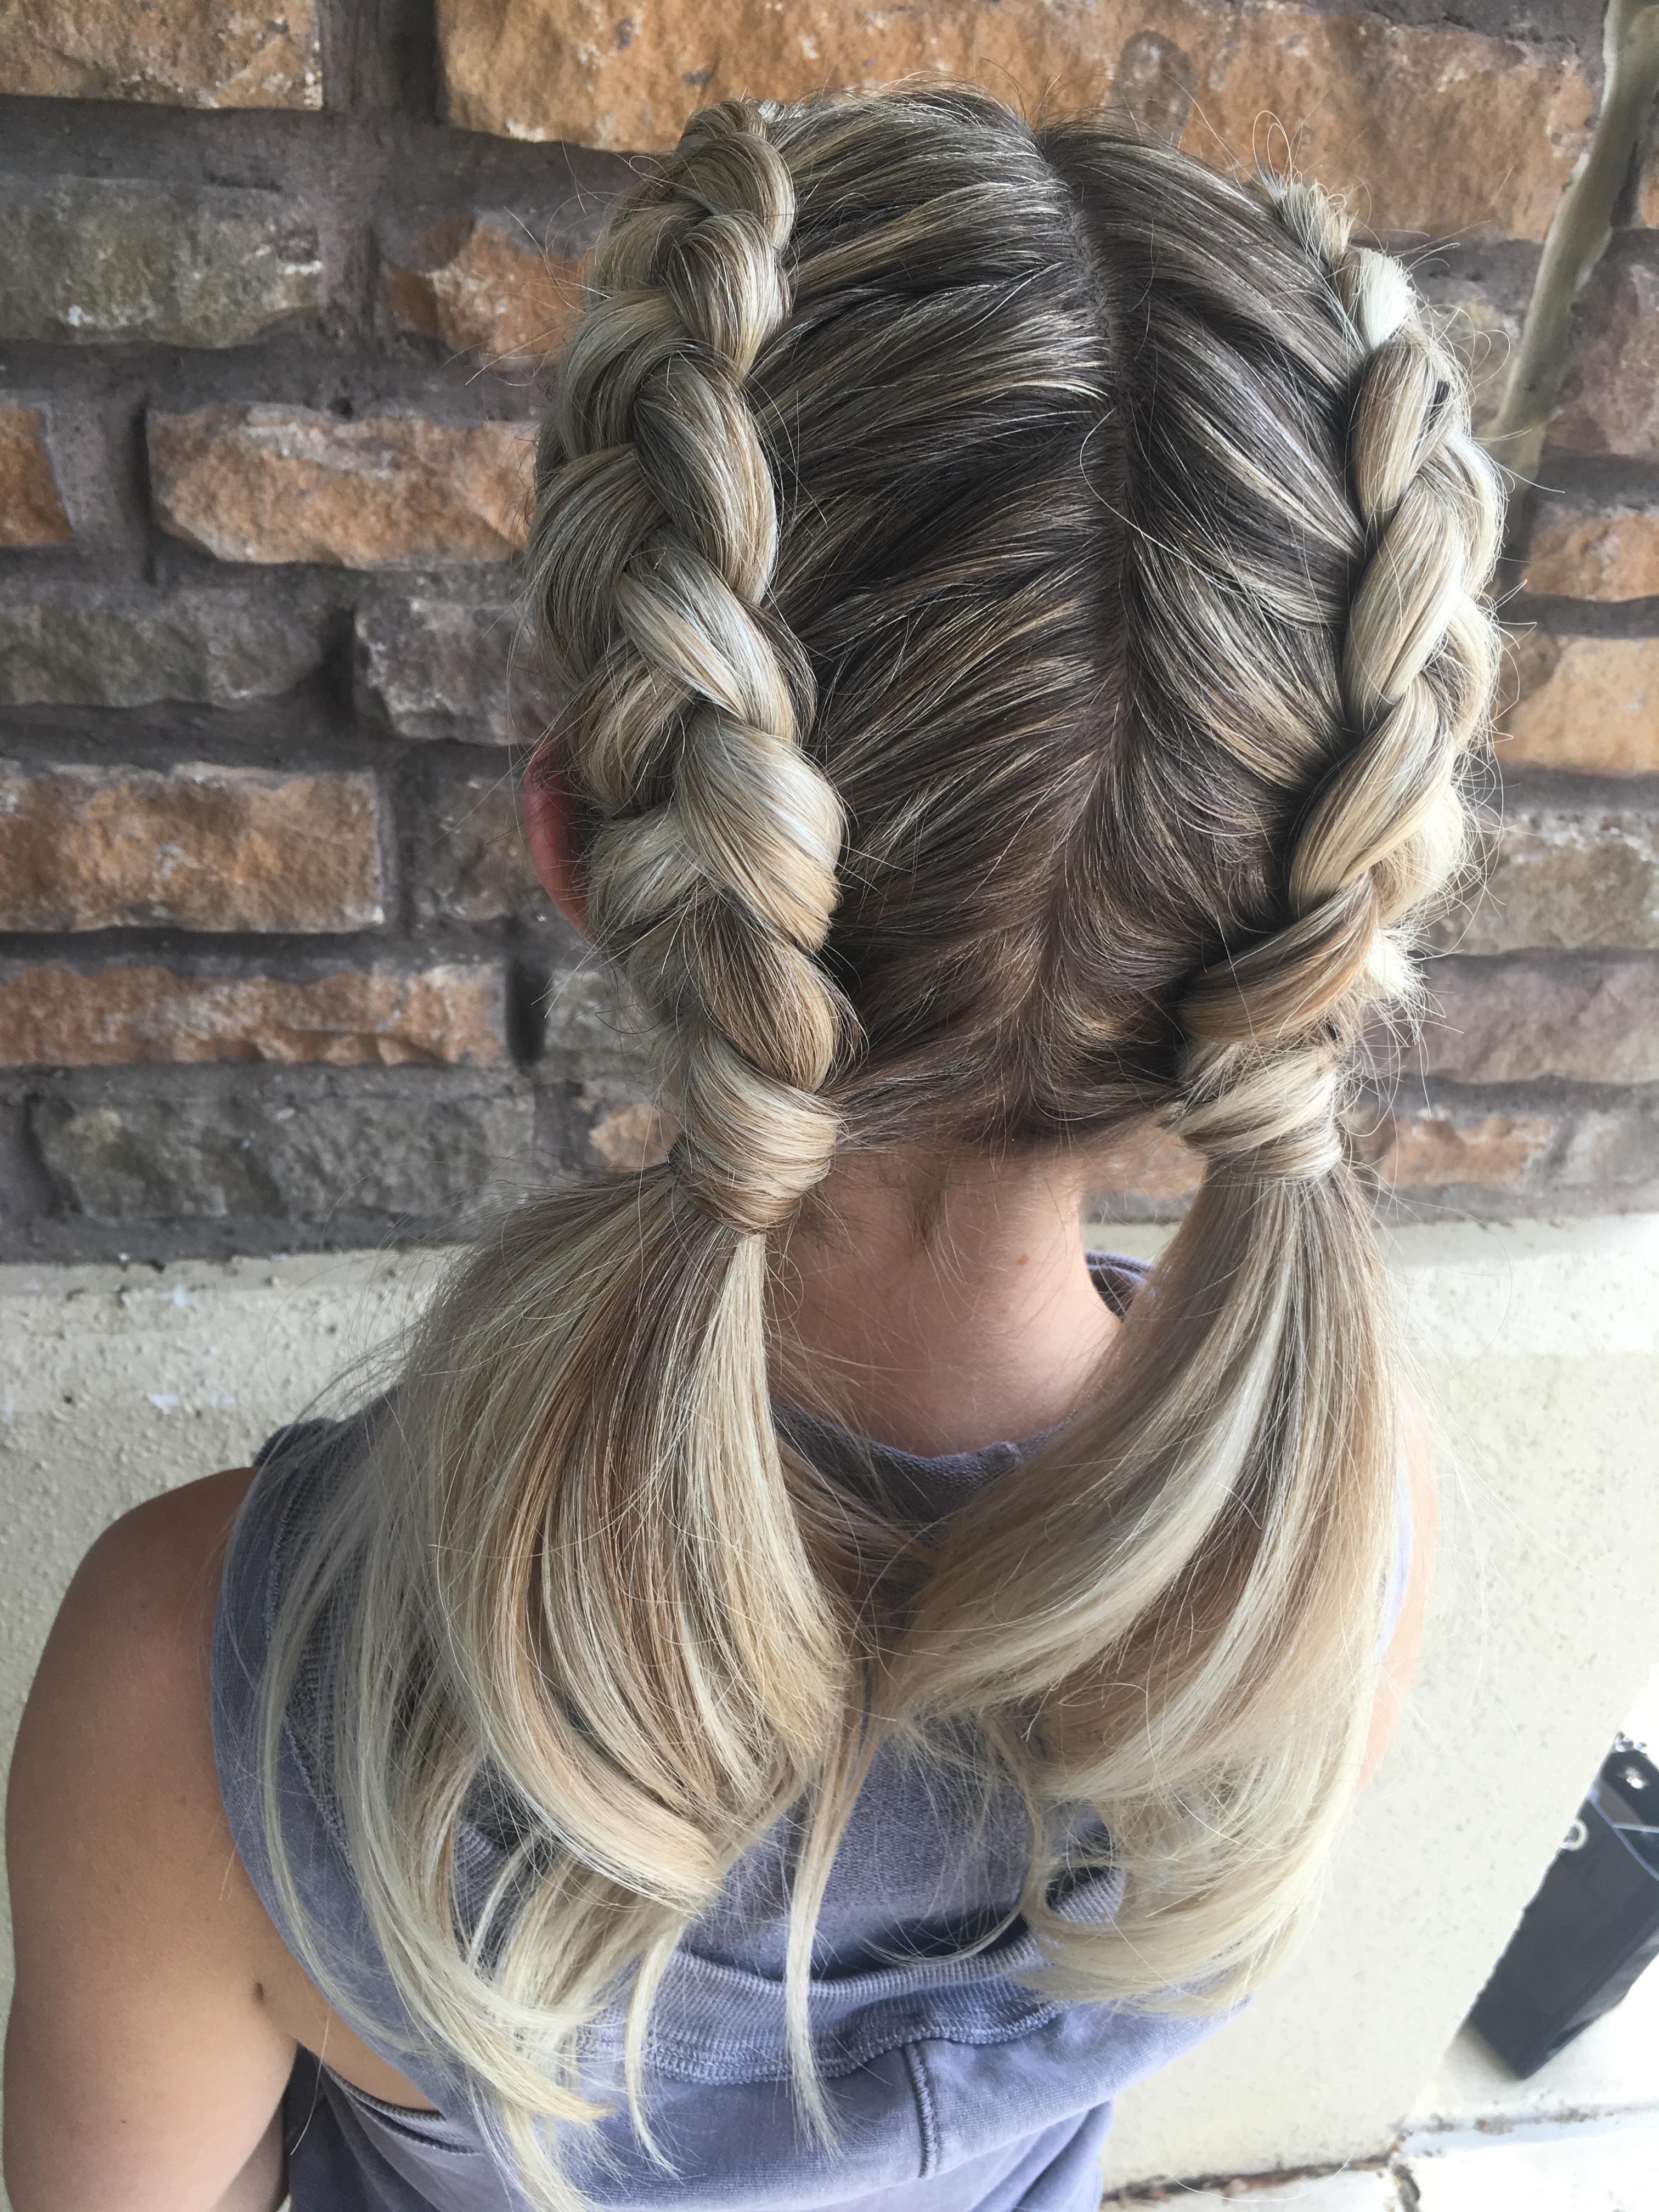 braids, buns, and ponys $35 two dutch braids into low pig